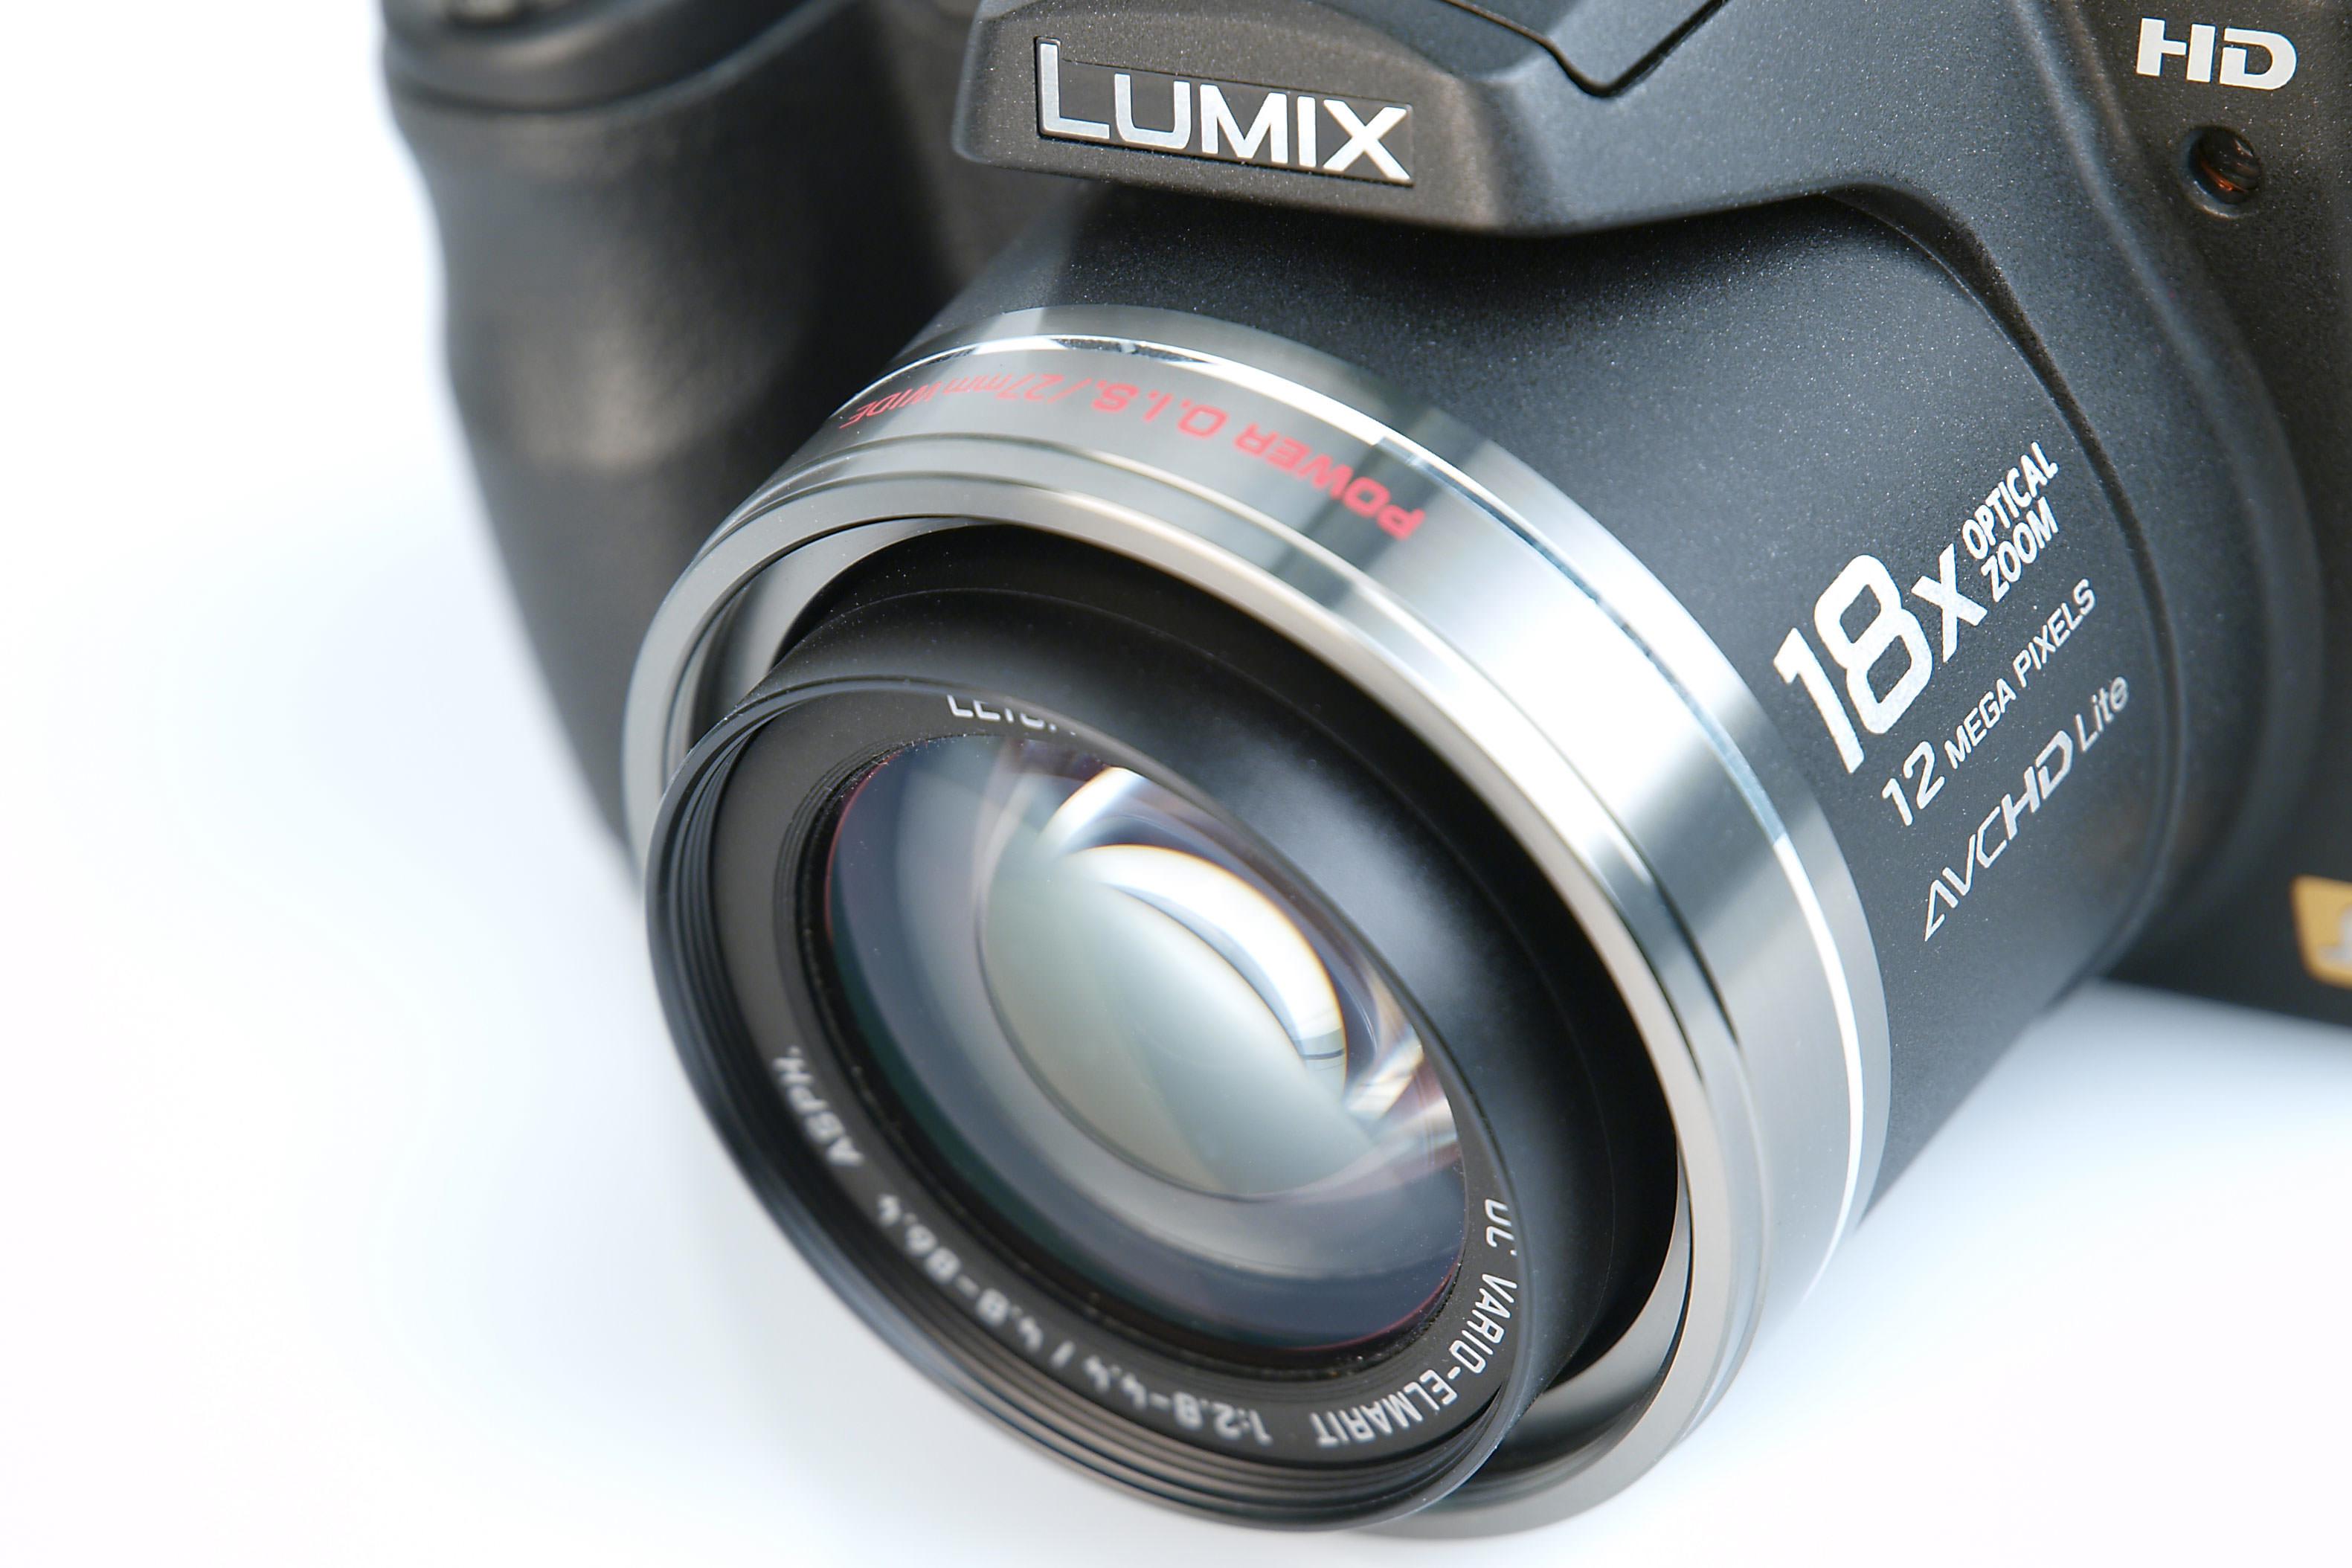 panasonic lumix dmc fz38 first look digital camera review. Black Bedroom Furniture Sets. Home Design Ideas